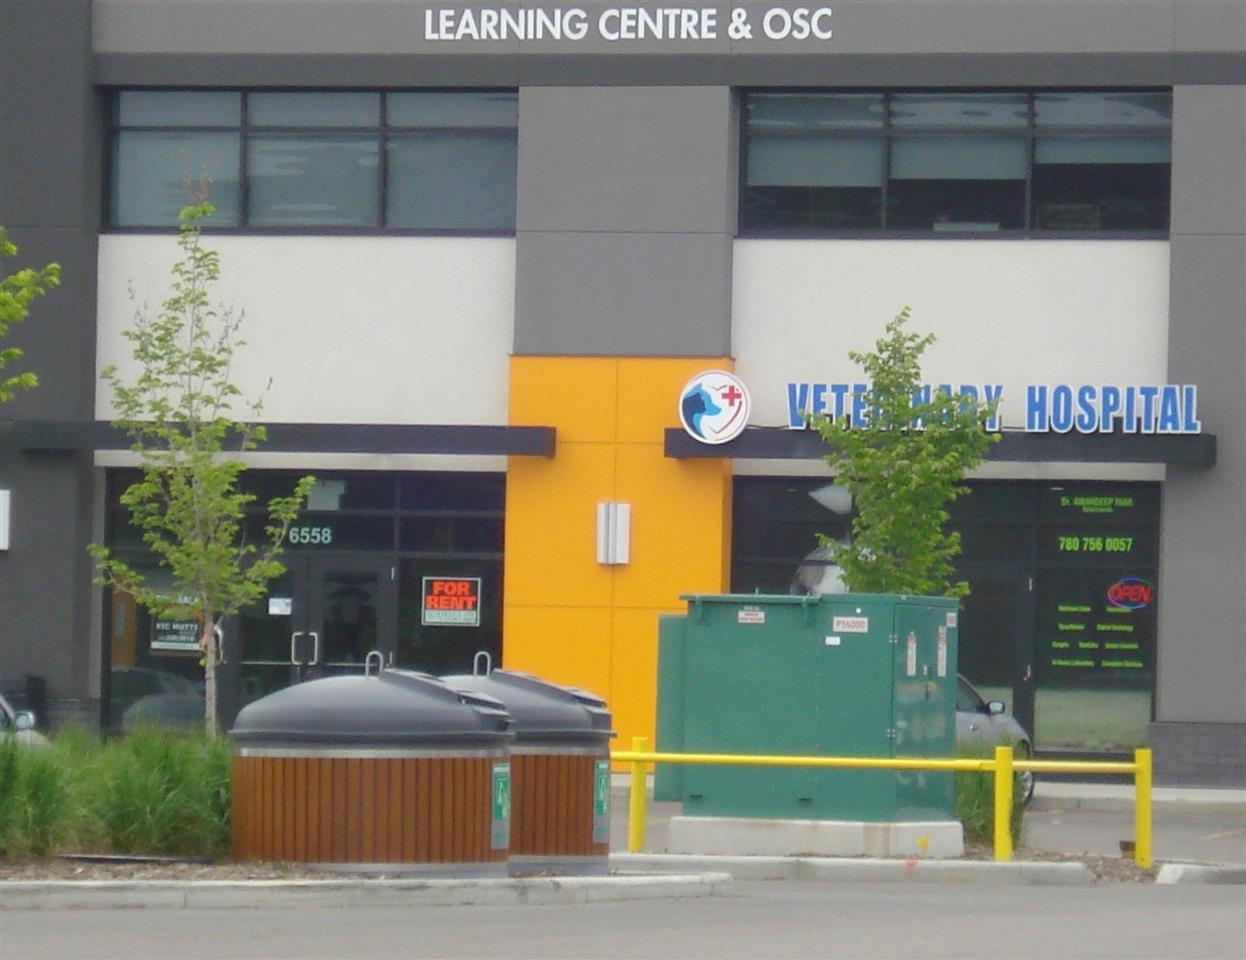 Main Photo: 00 00 in Edmonton: Zone 03 Business for sale : MLS®# E4195943